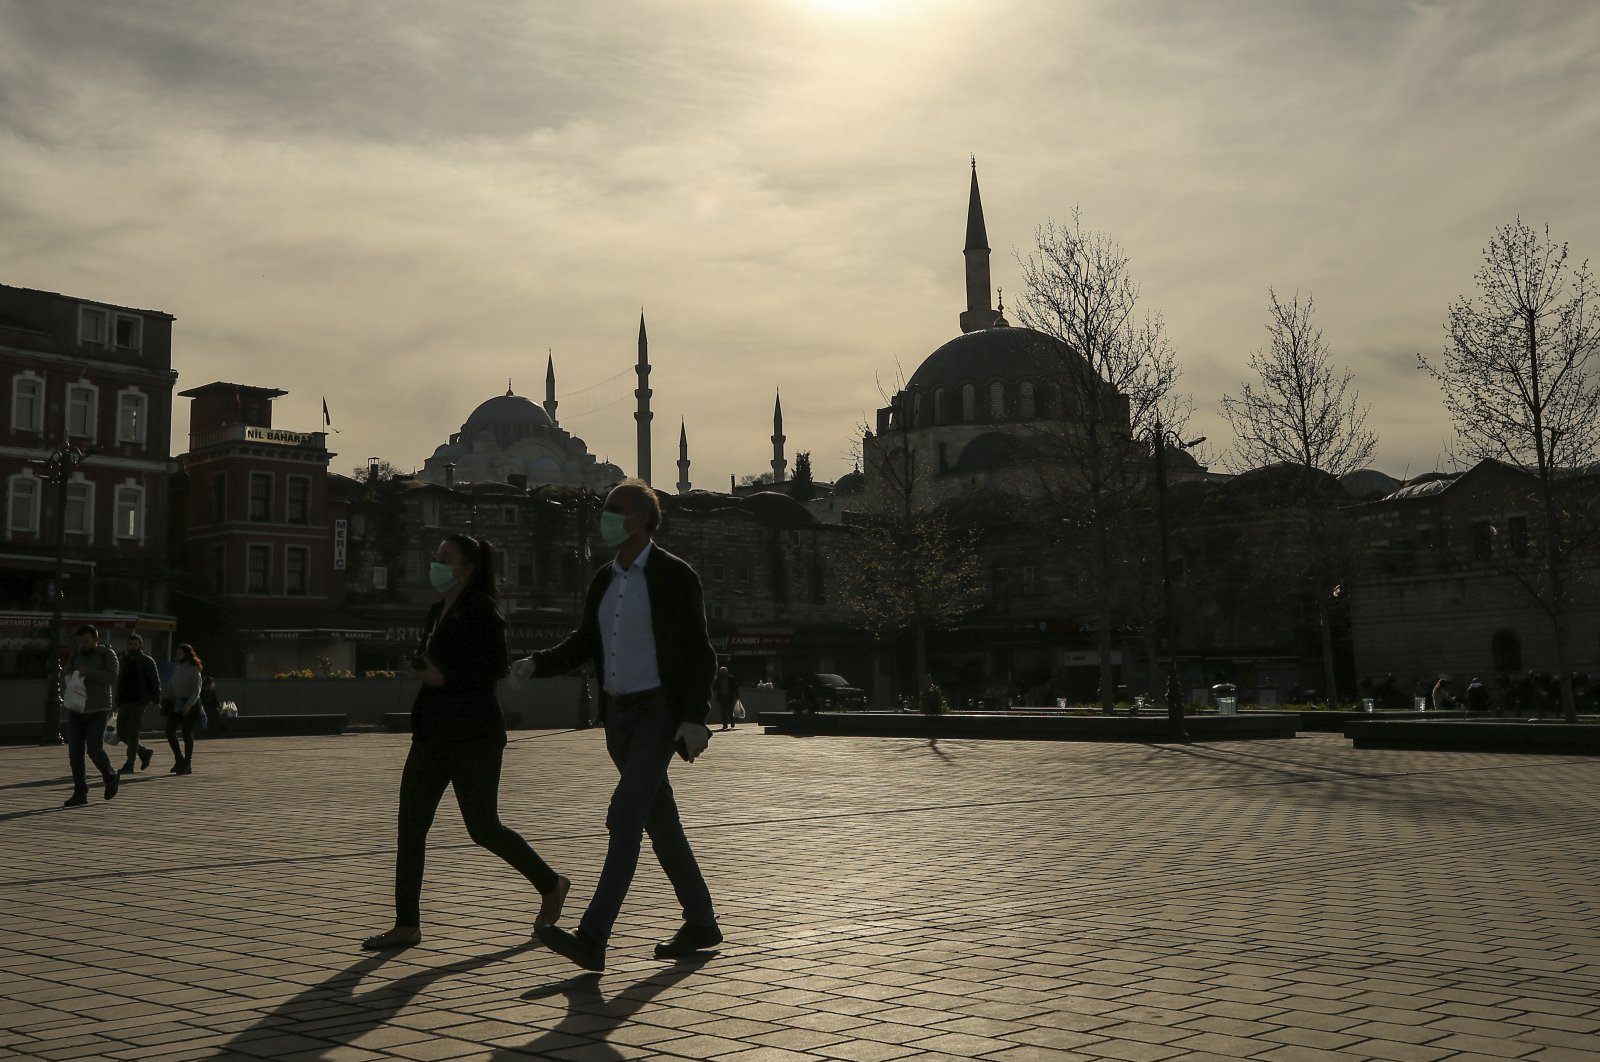 People wearing masks walk in the Eminönü neighborhood with iconic Süleymaniye Mosque in the backdrop, Istanbul, Turkey, April 17, 2020. (AP Photo)